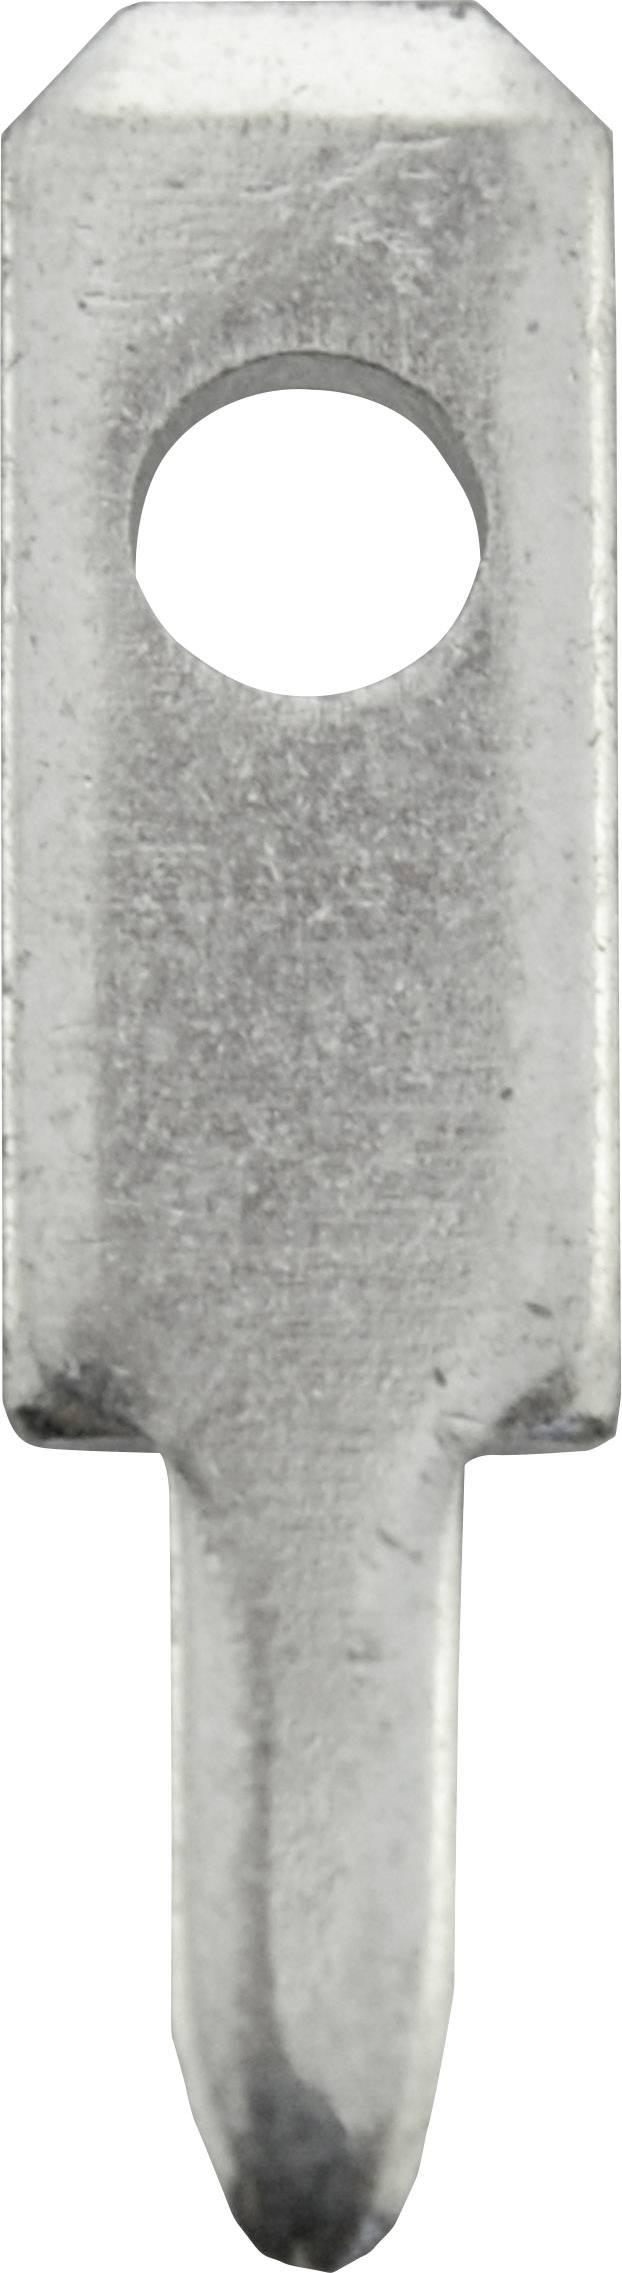 Faston zástrčka Vogt Verbindungstechnik 3779t.68 2.8 mm x 0.8 mm, 180 °, bez izolace, kov, 100 ks